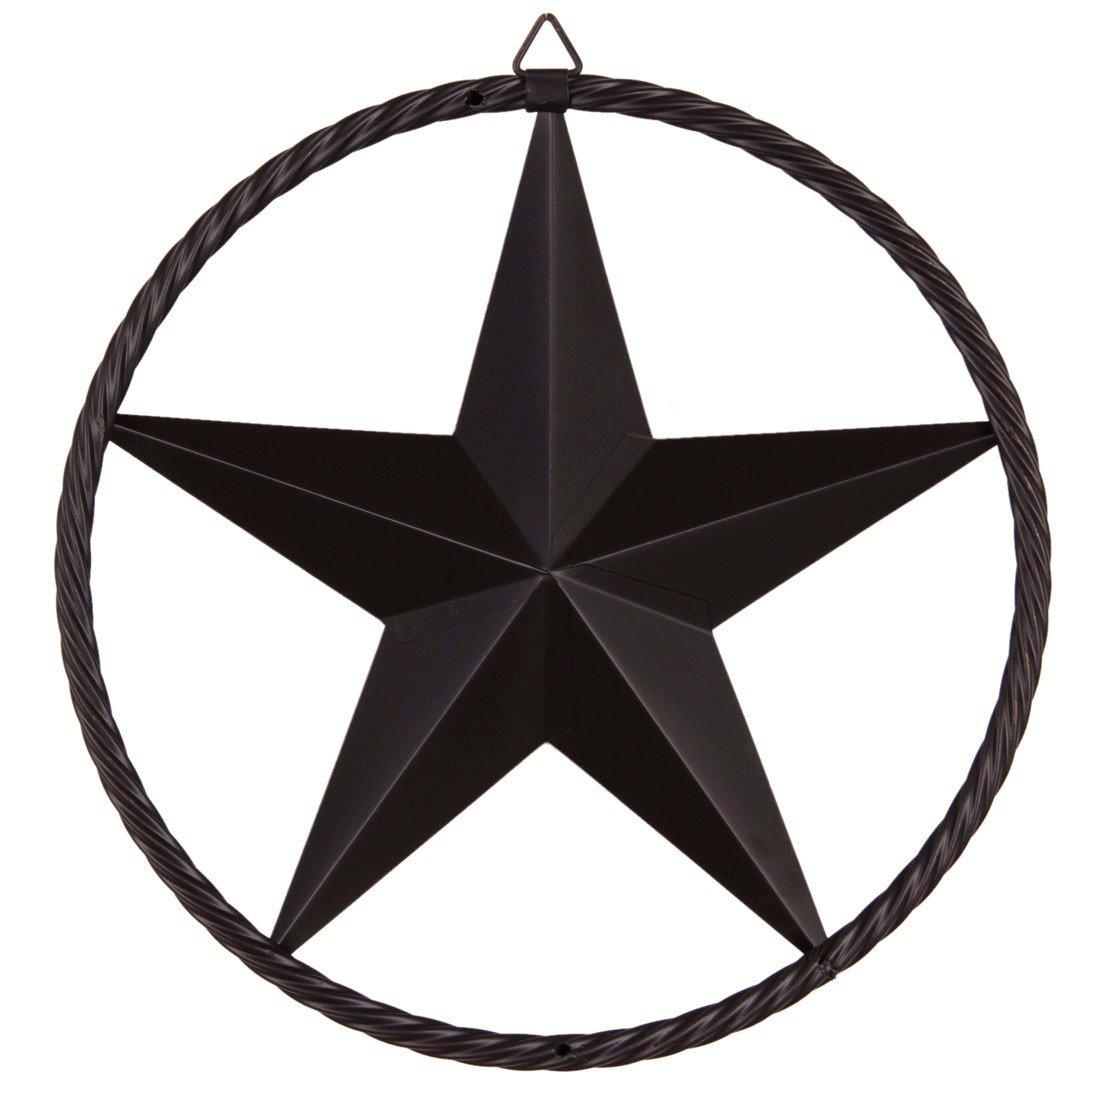 Paixpays 12/17/24\'\'Bronze Metal Circle Ring Star Hanging Home Wall/Door  Decor.